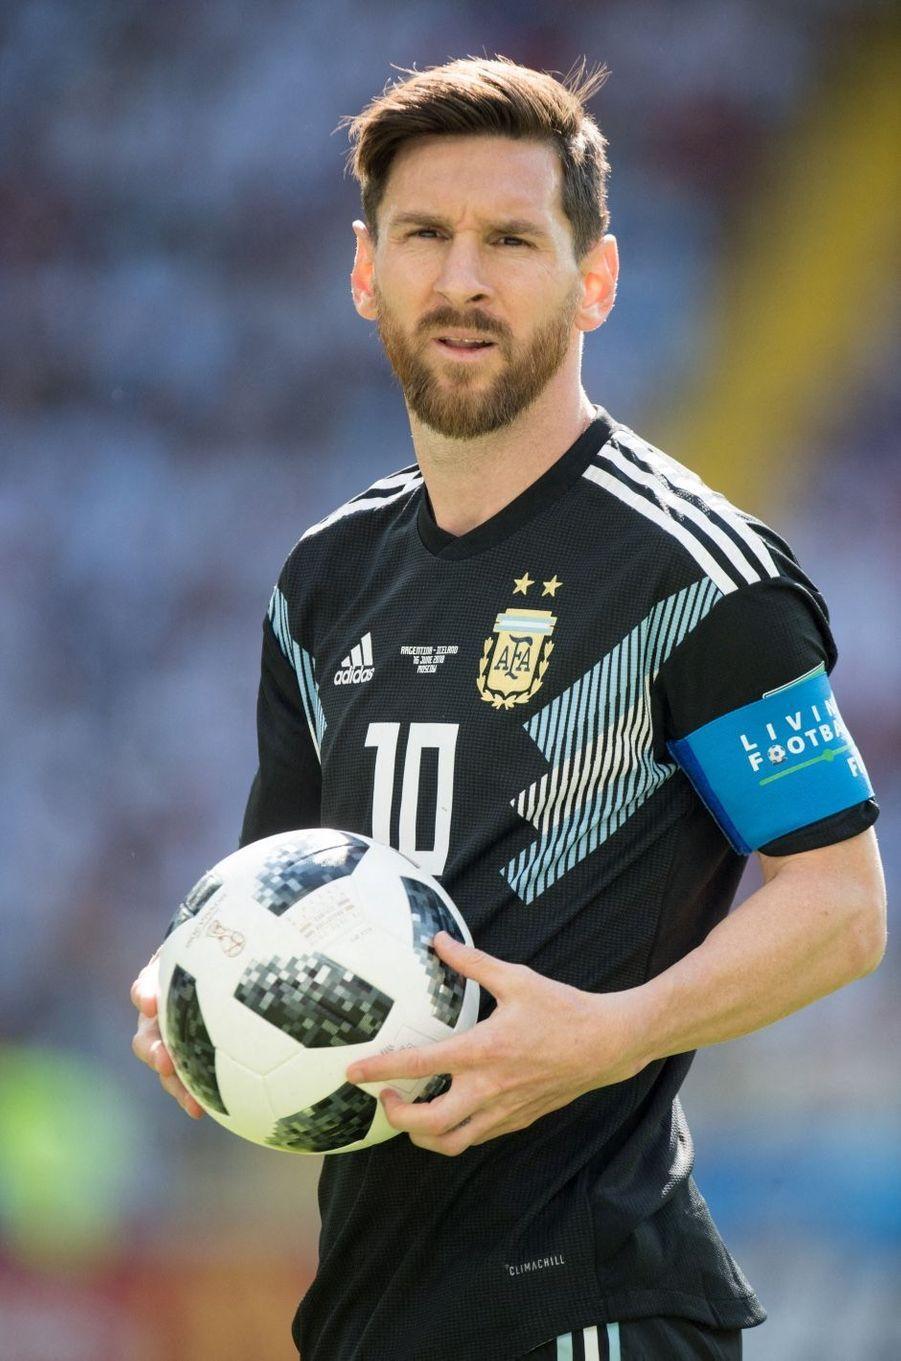 5 - Lionel Messi, 104 millions de dollars